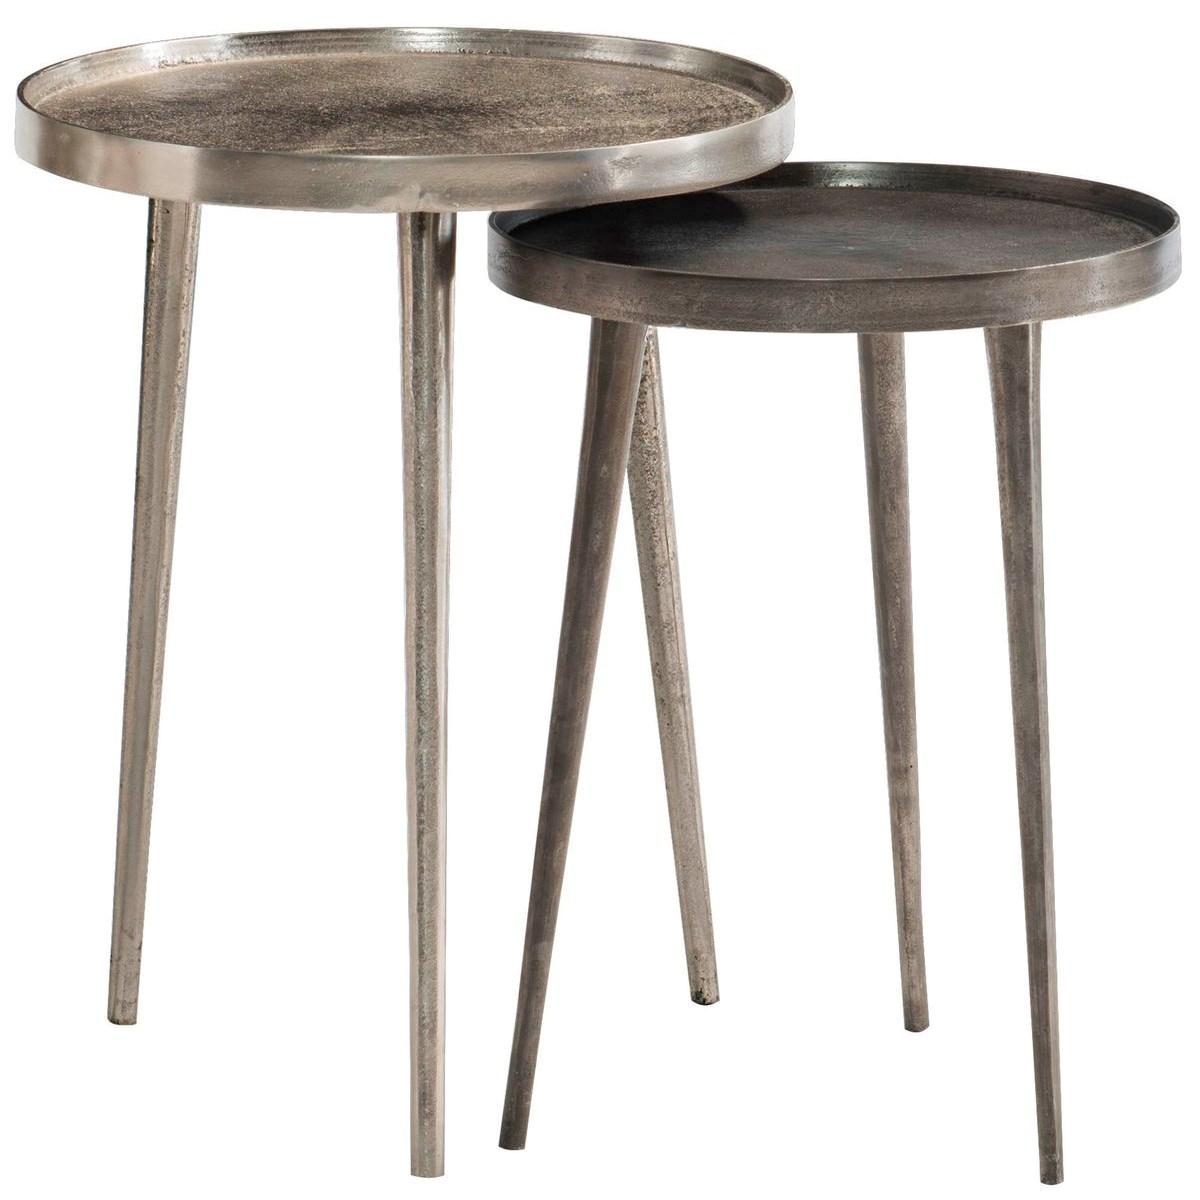 Lex Nesting Tables, Set of 2